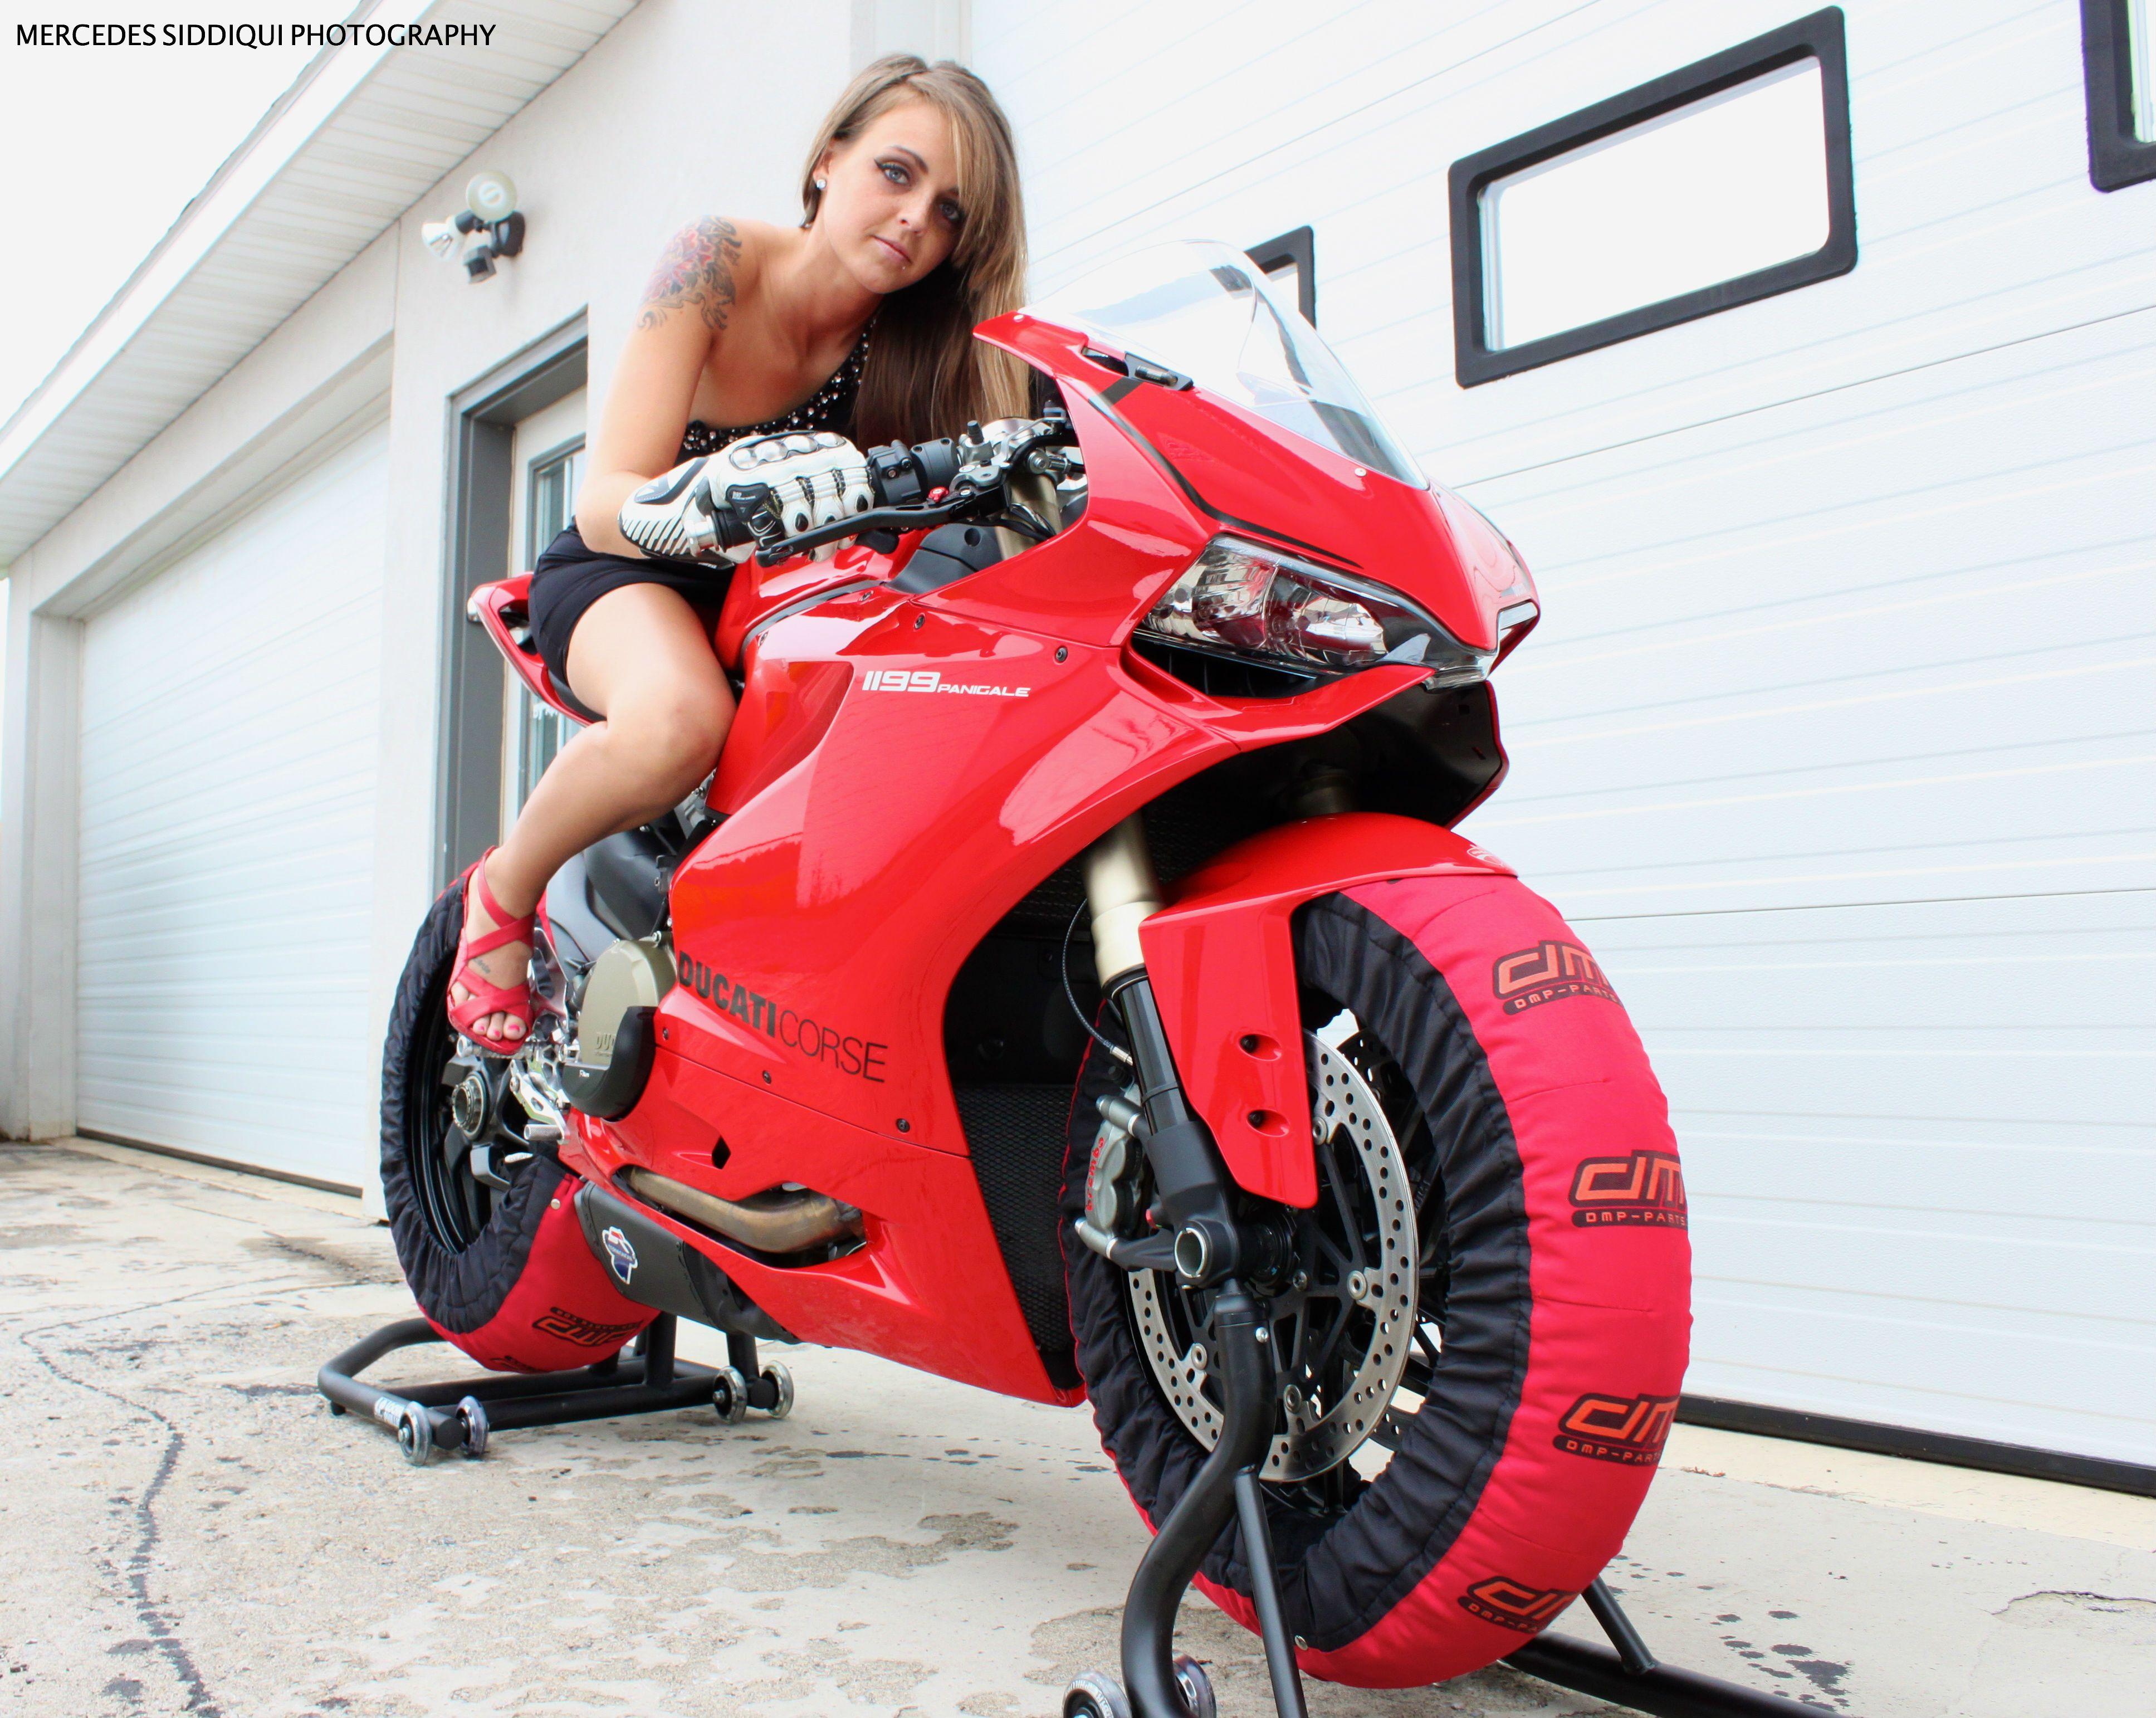 Mercedes siddiqui photography 2013 model naomi www for Garage mercedes corse